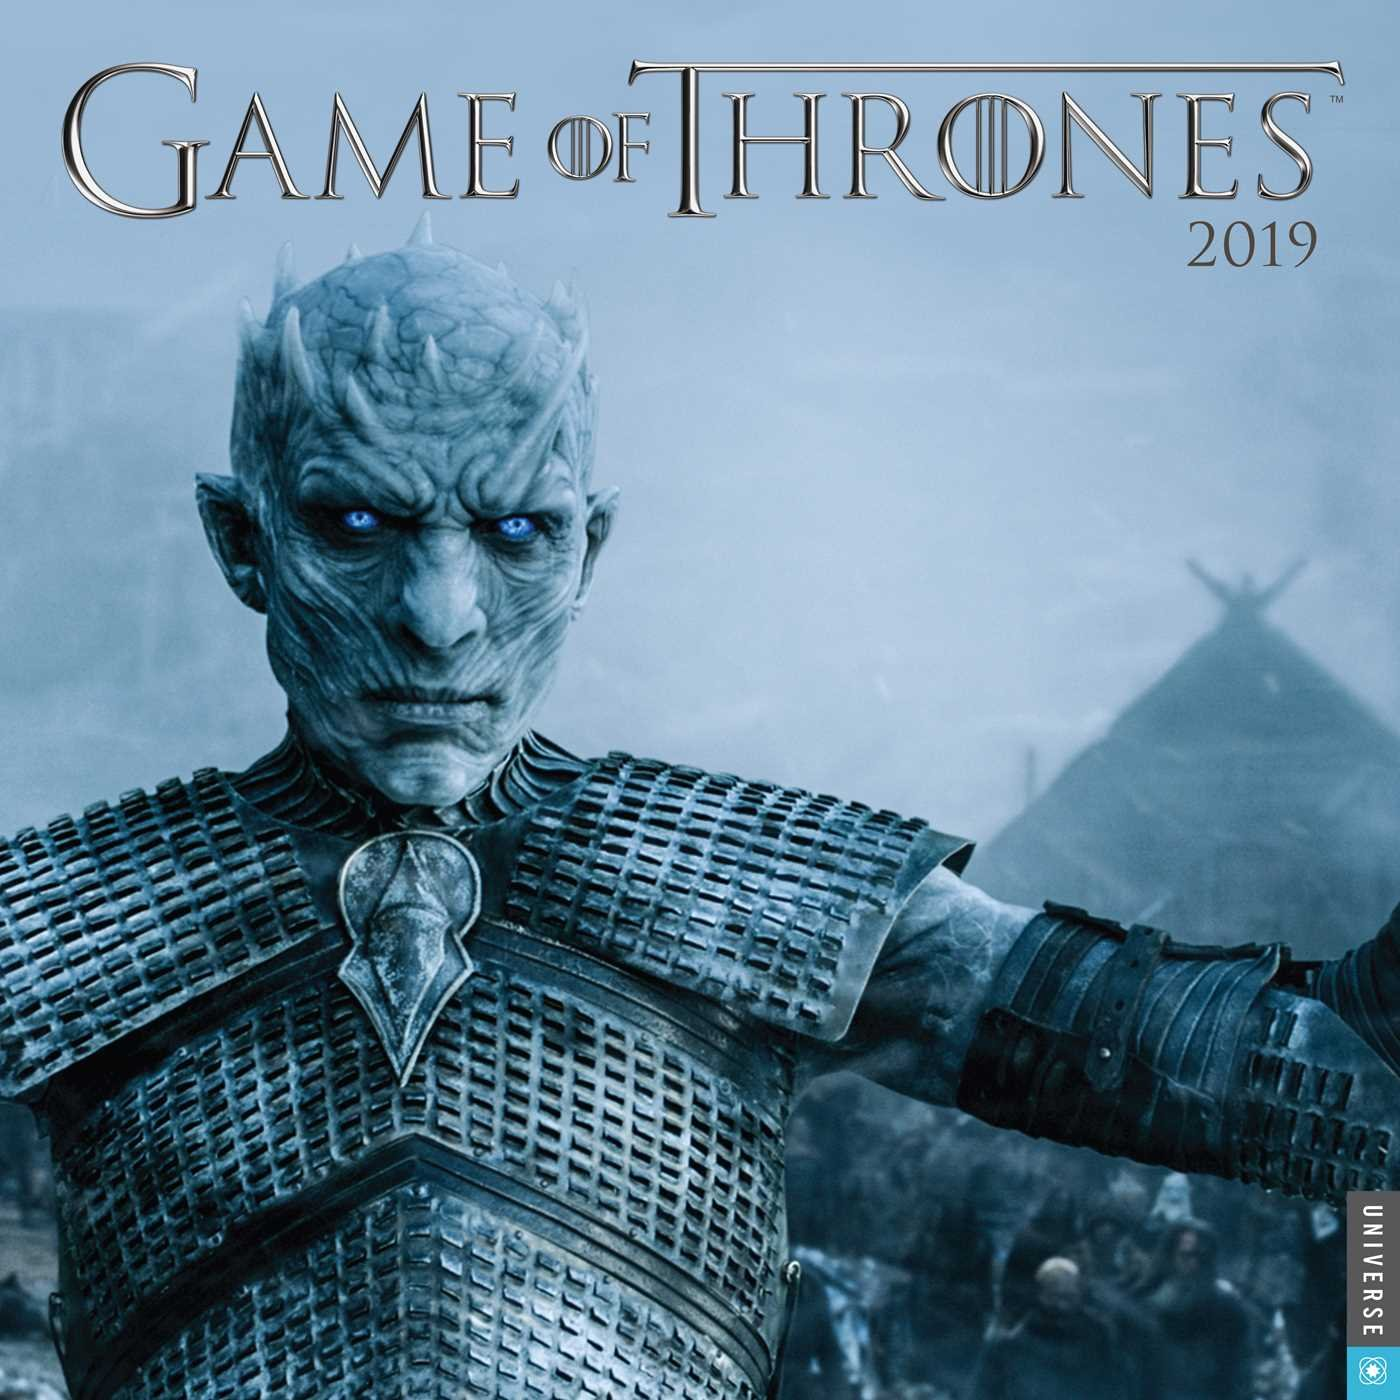 Game of Thrones 2019 Wall Calendar: HBO: 9780789334954 ...